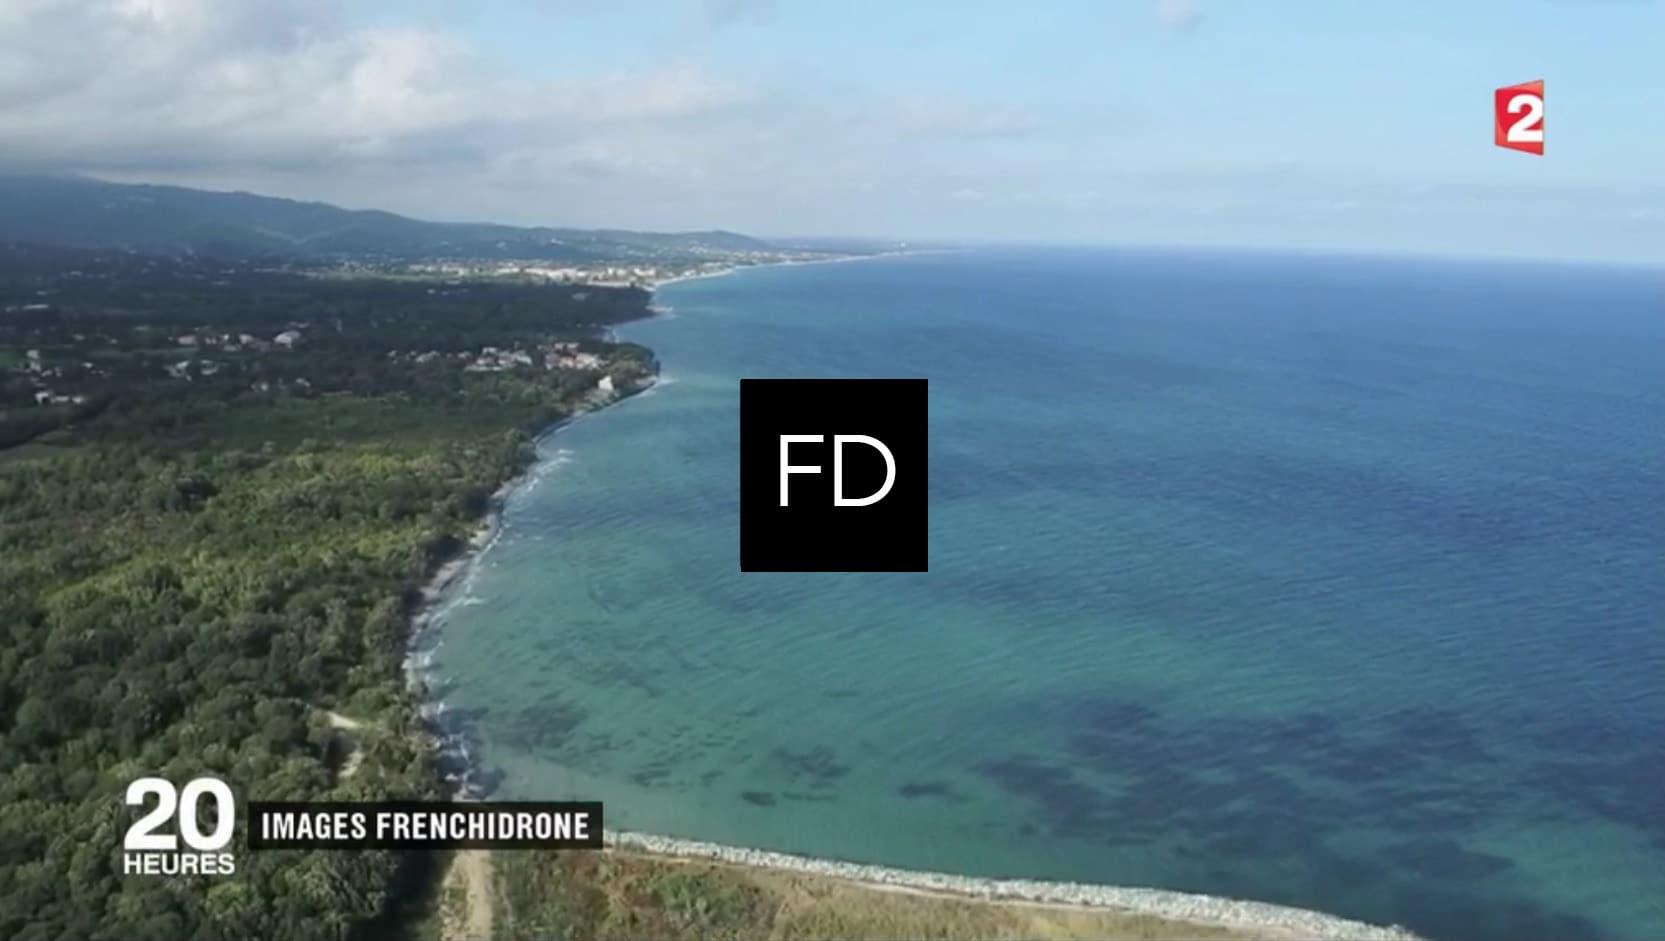 Frenchidrone-20H-France-2-1